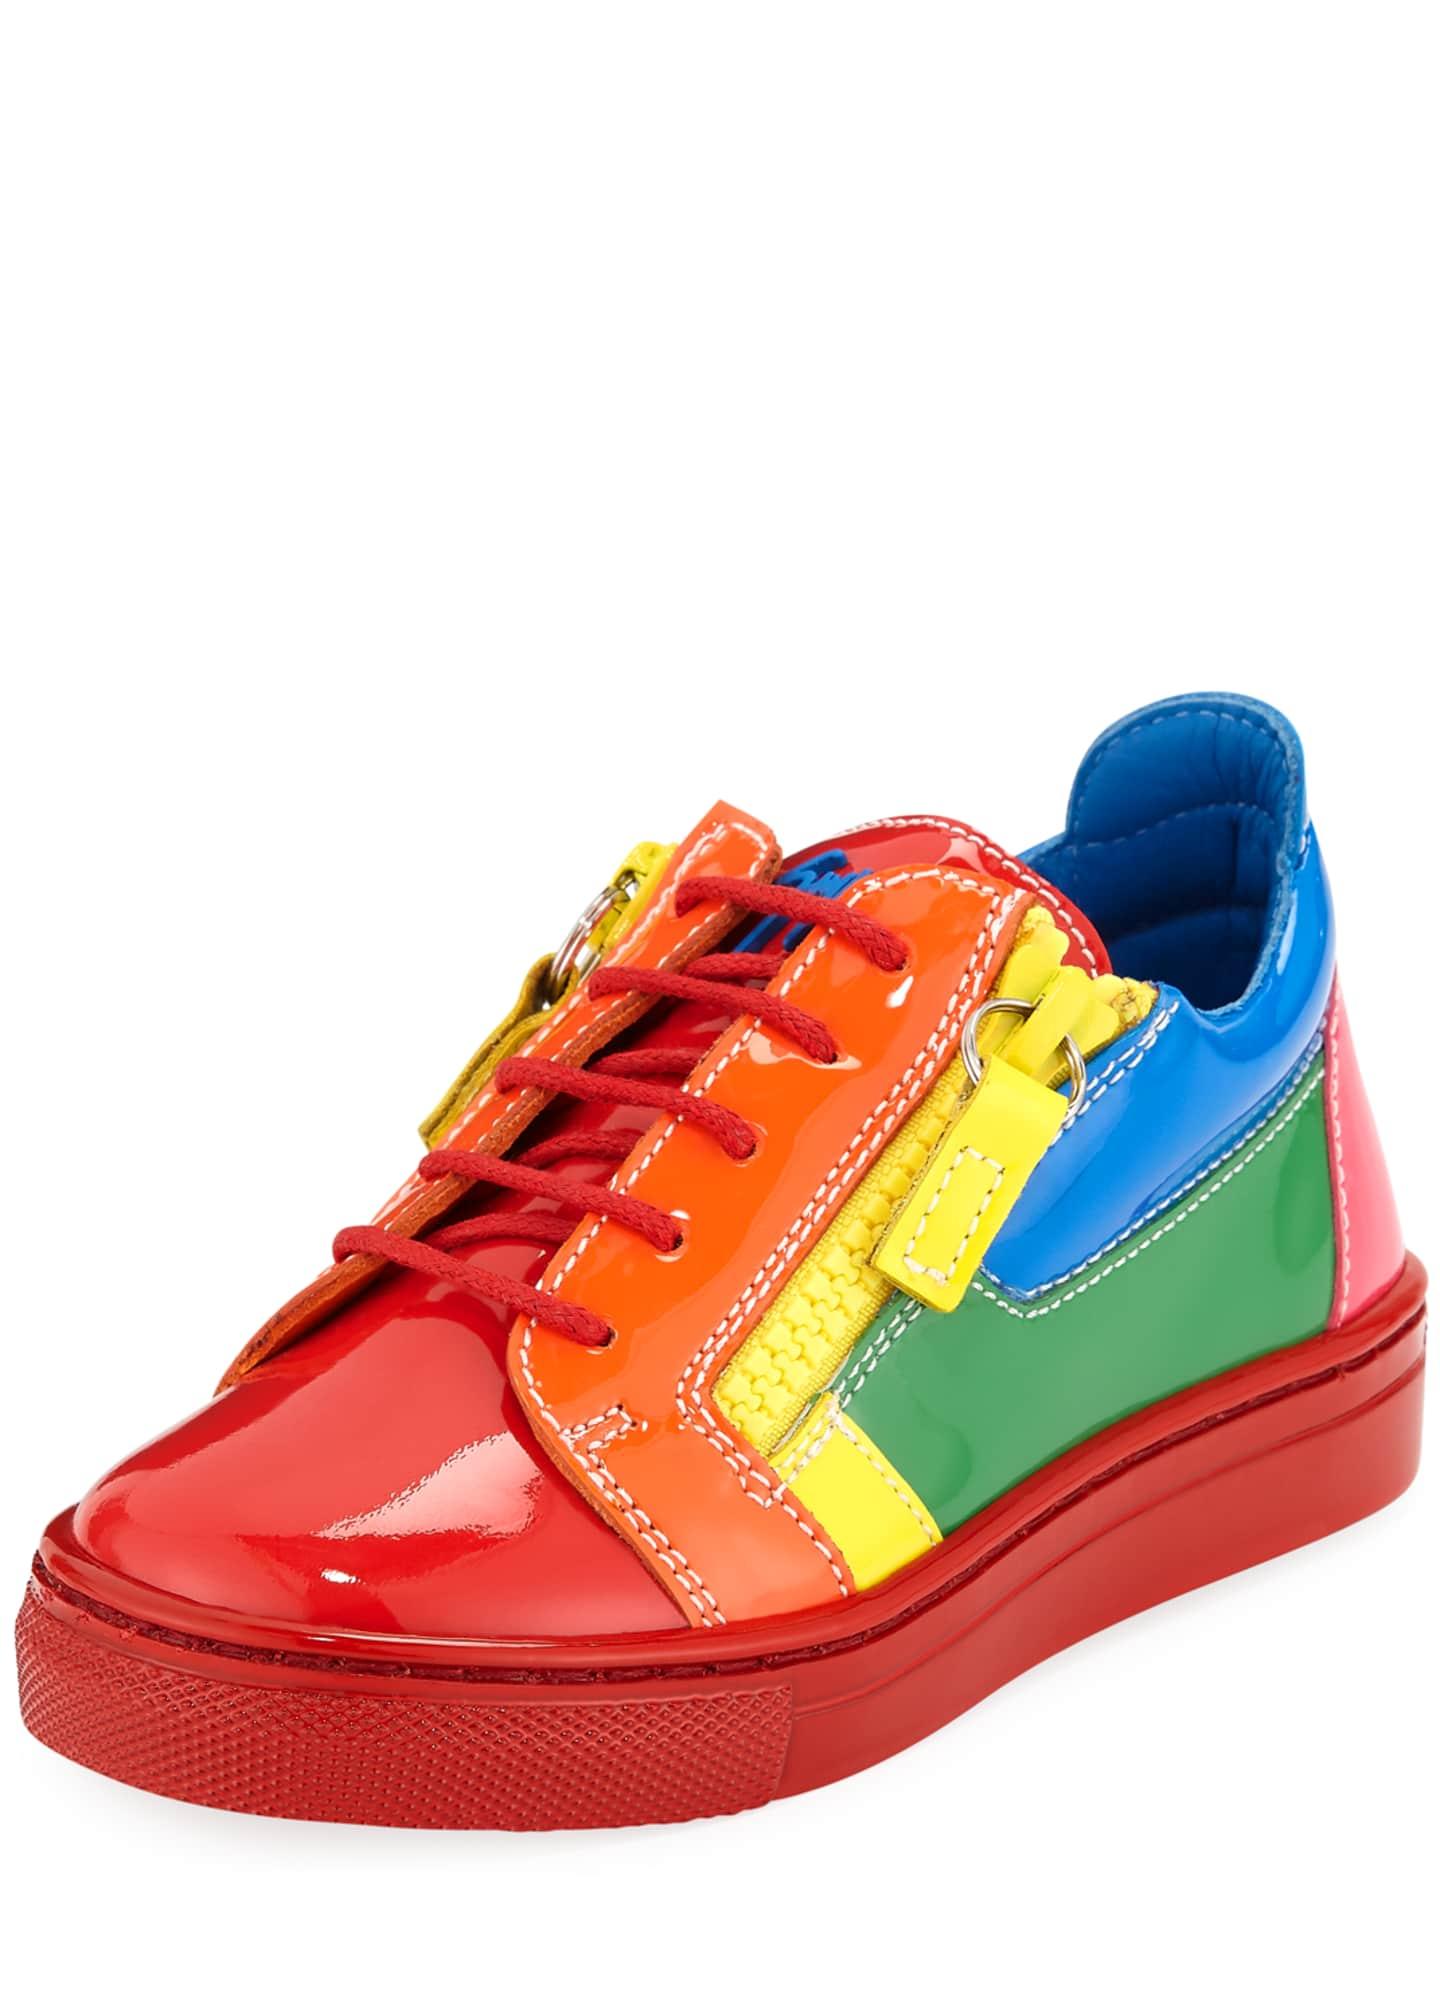 Giuseppe Zanotti Rainbow Patent Leather Low-Top Sneakers,